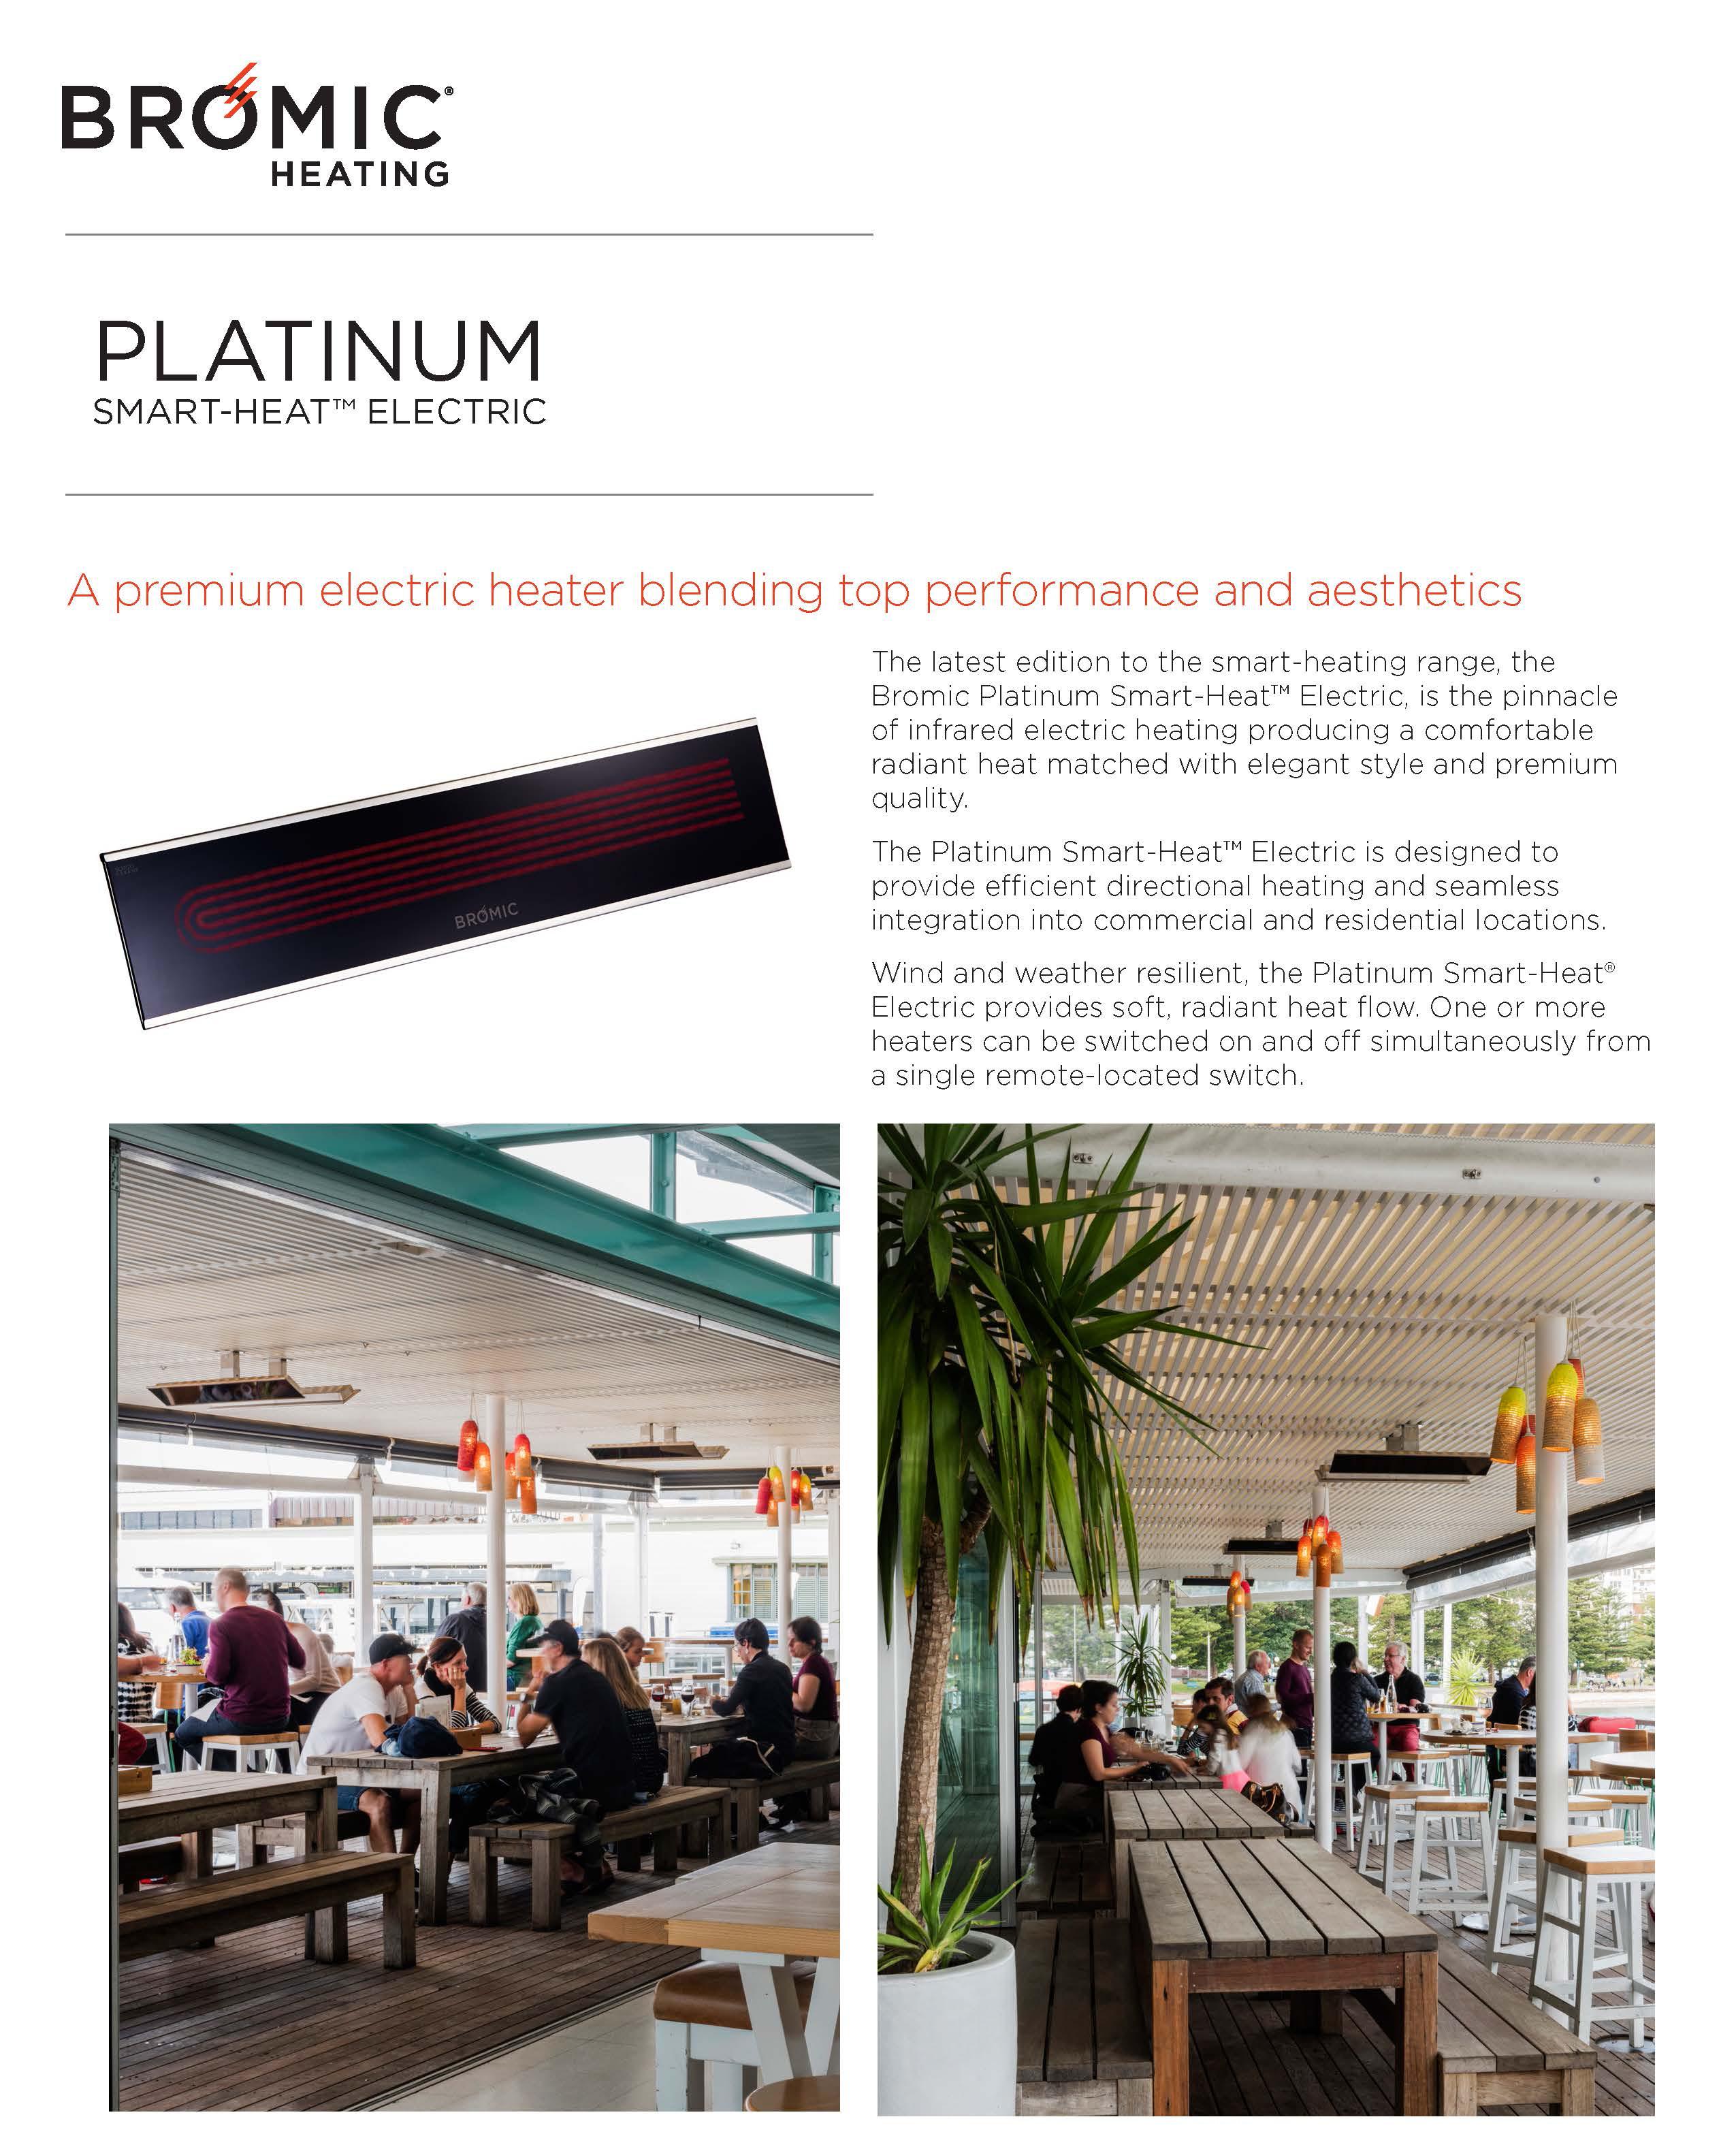 platinum-electric-s2-page-1.jpg